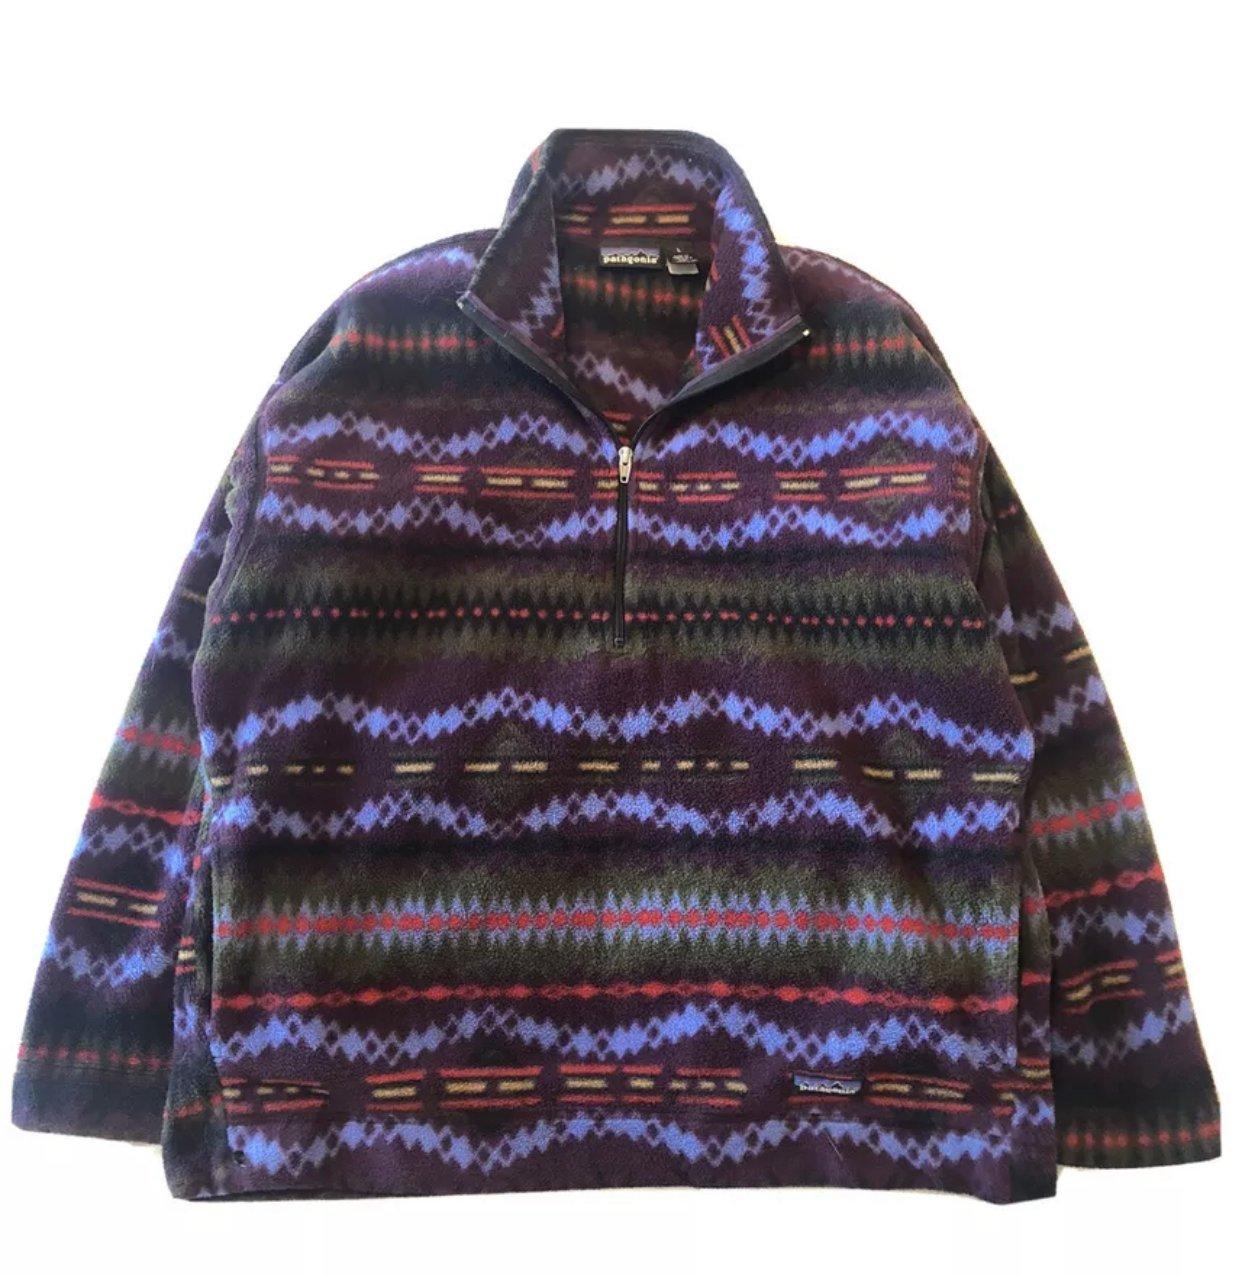 Image of Vintage Patagonia Fall 04 Aztec 1/2 Zip Reto Fleece Made USA L